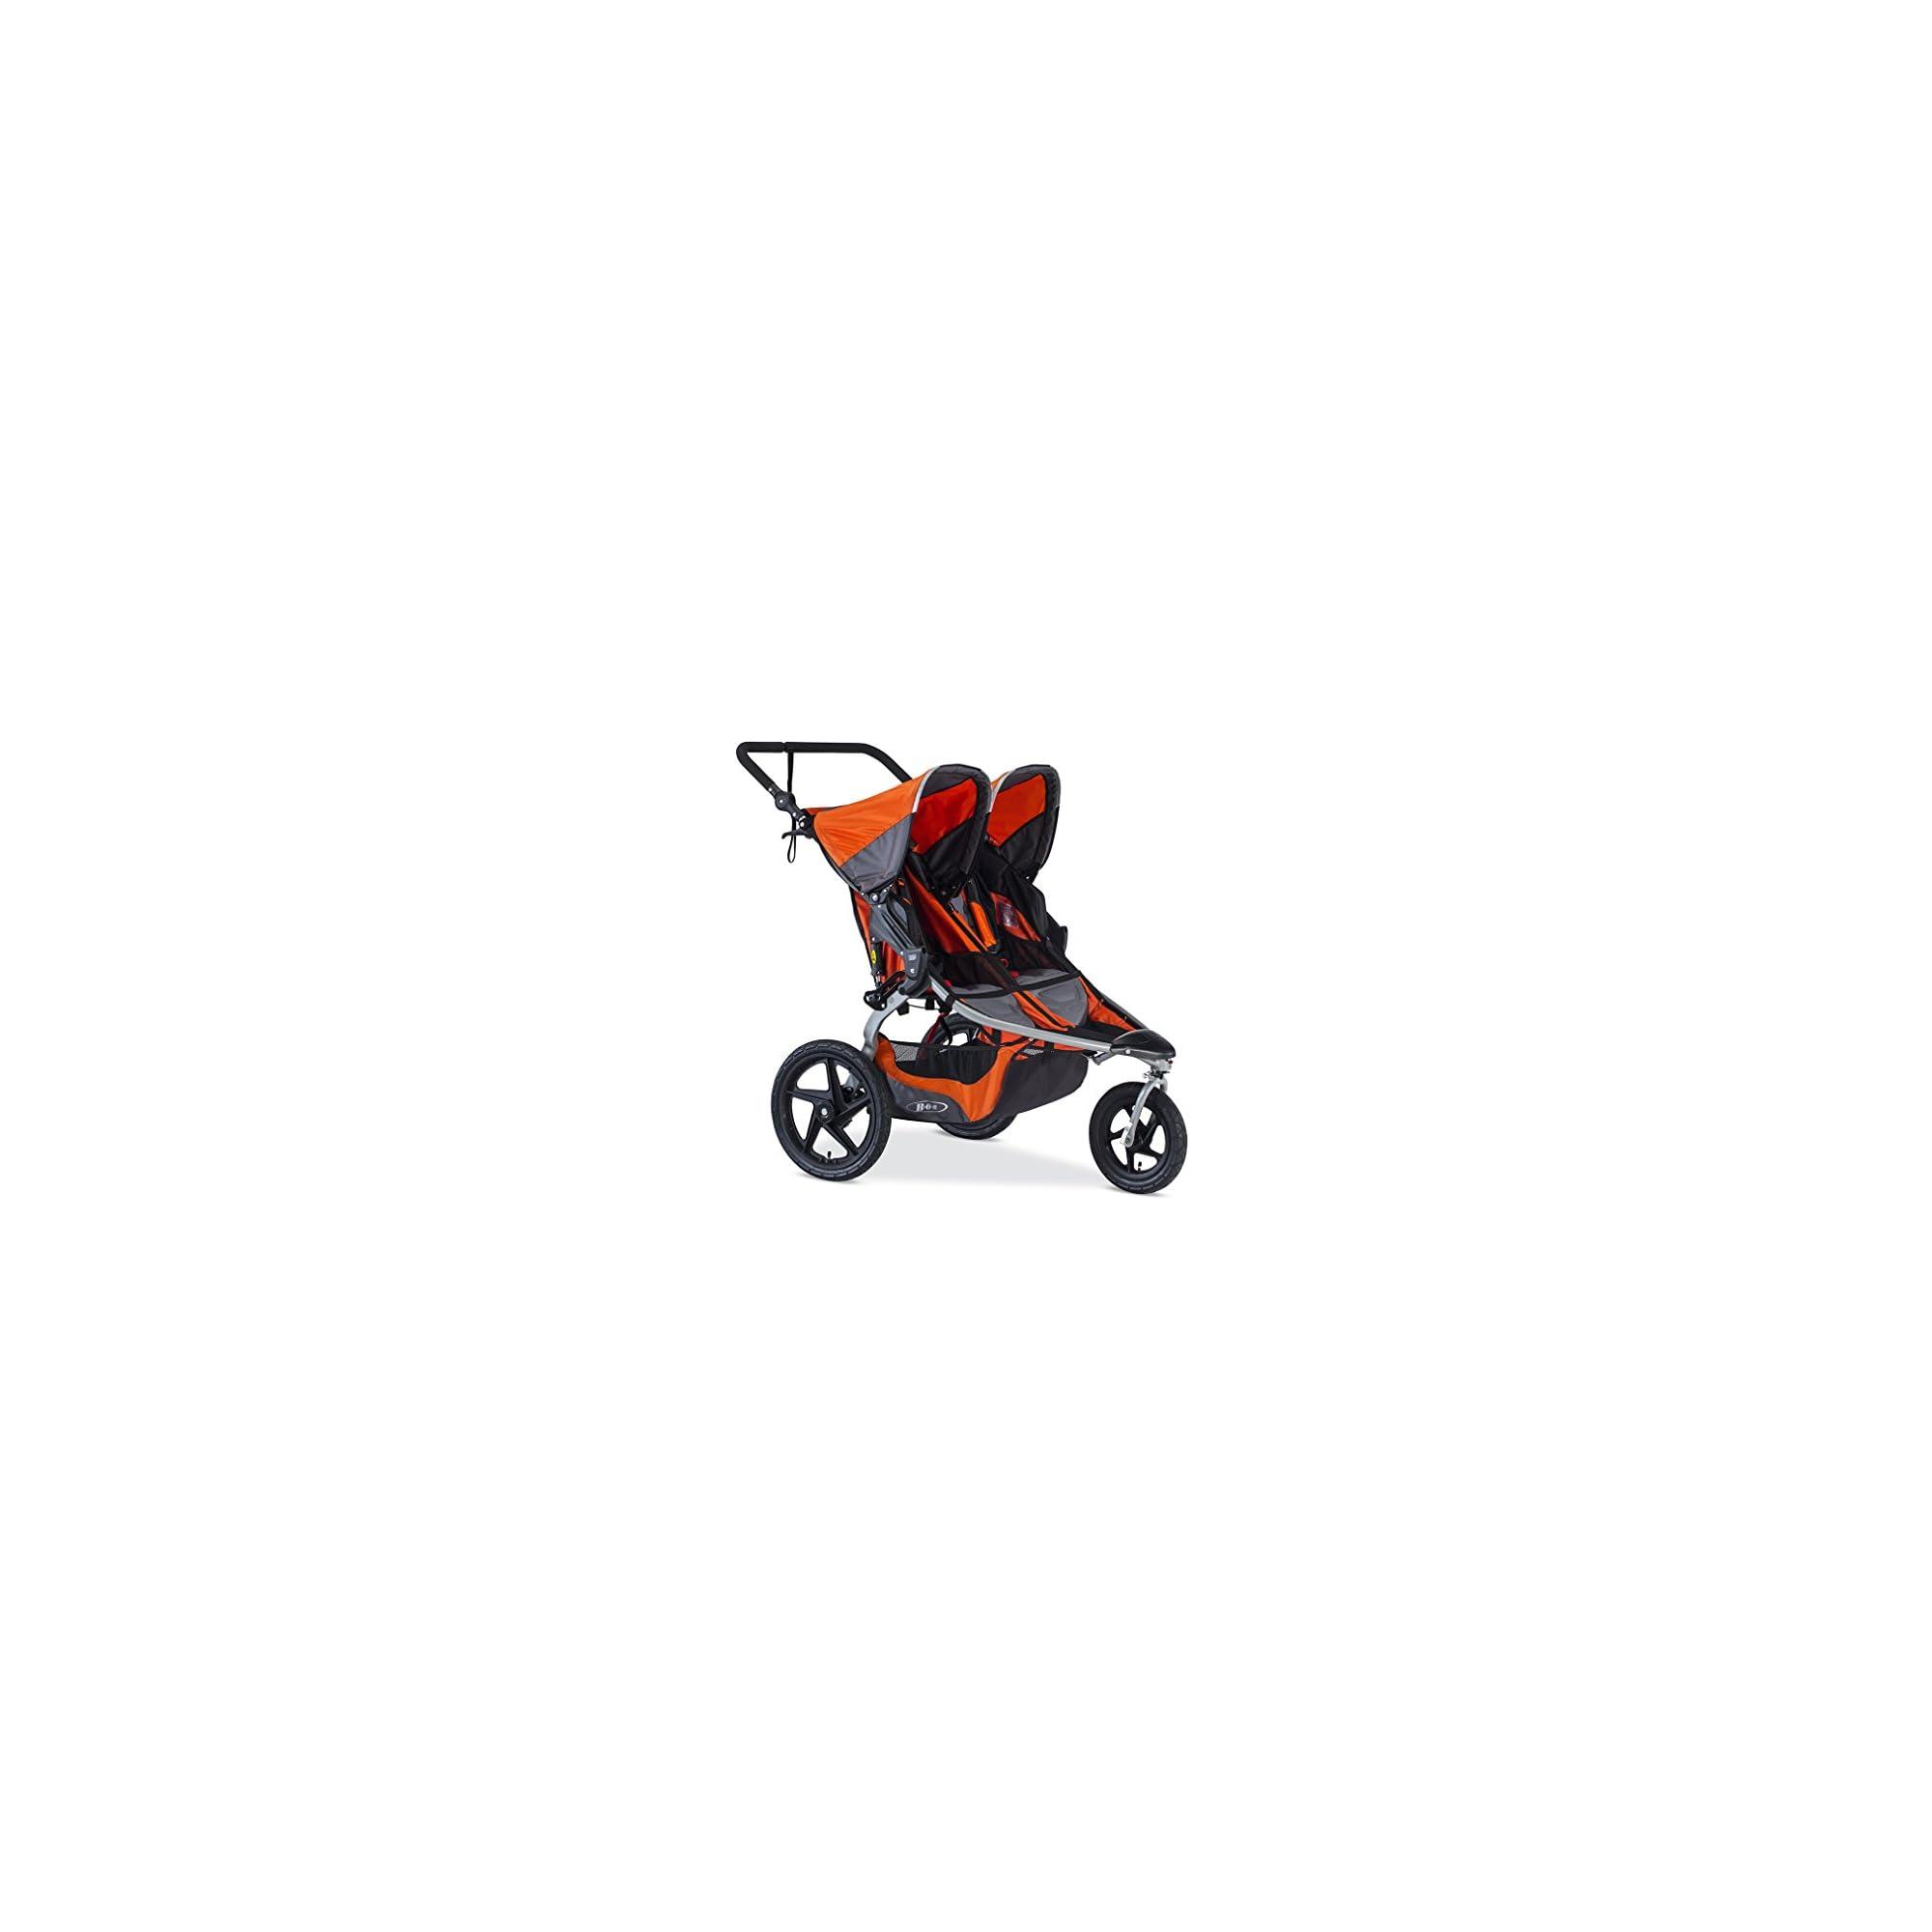 BOB Revolution Flex Duallie 2.0 Jogging Stroller – Up to 100 pounds – UPF 50Plus canopy – Adjustable Handlebar, Canyon